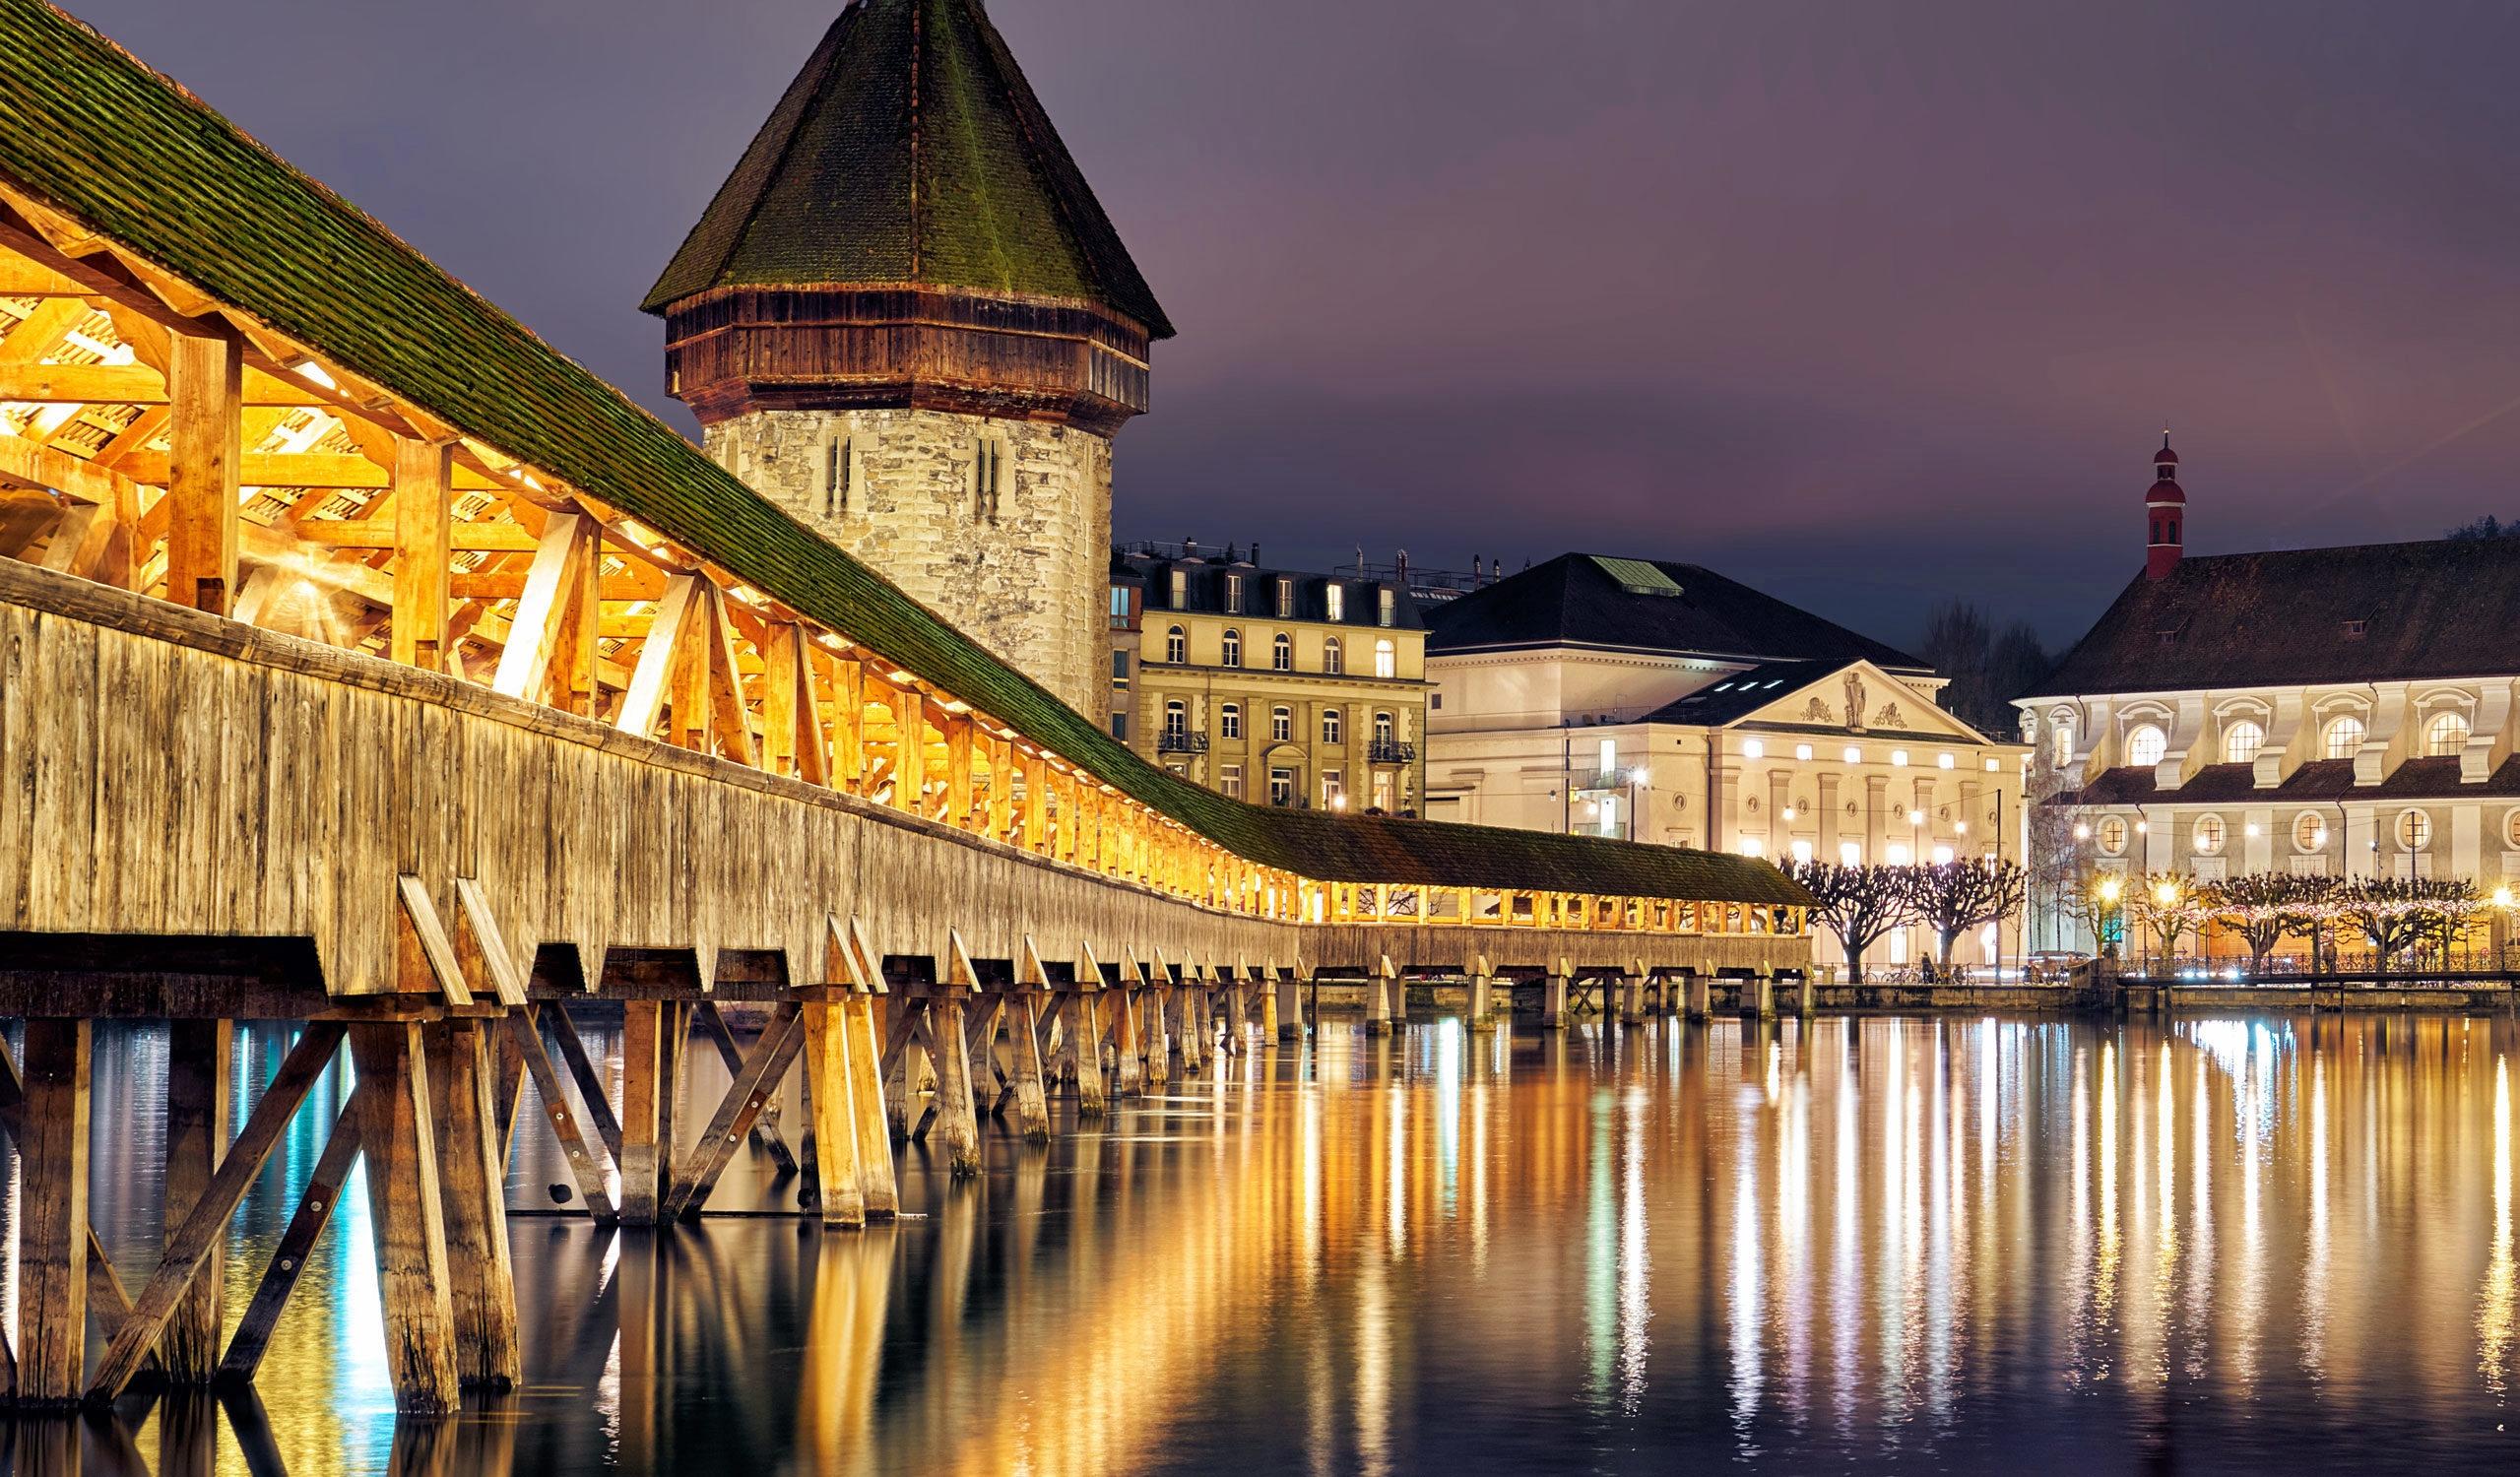 سويسرا لوسيرن اجمل الاماكن السياحيه جسر تشابل لوسيرن